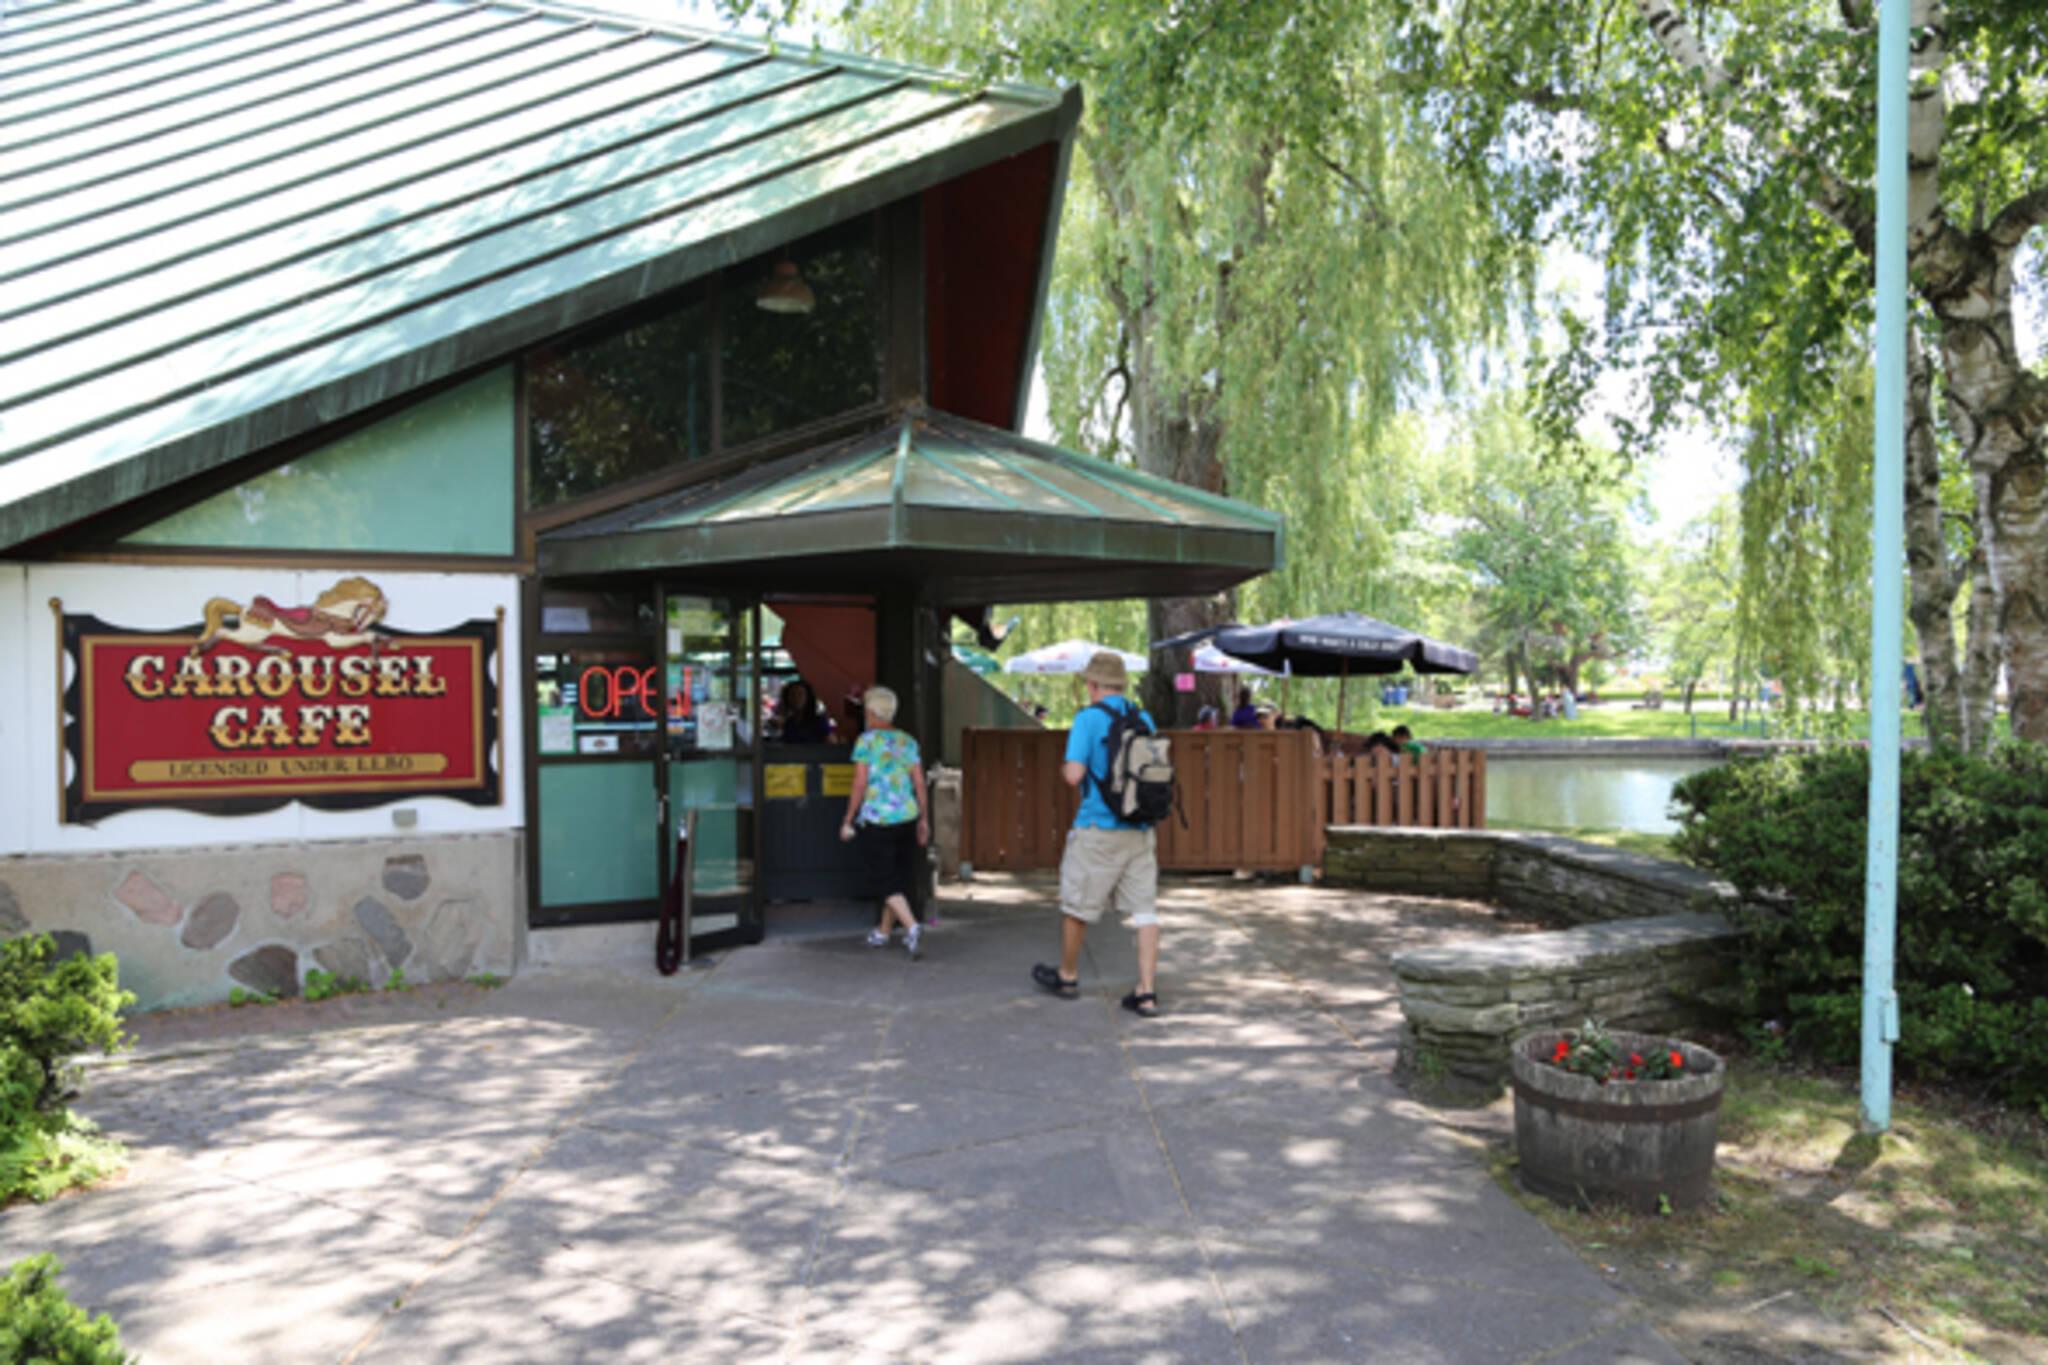 Carousel Cafe Toronto